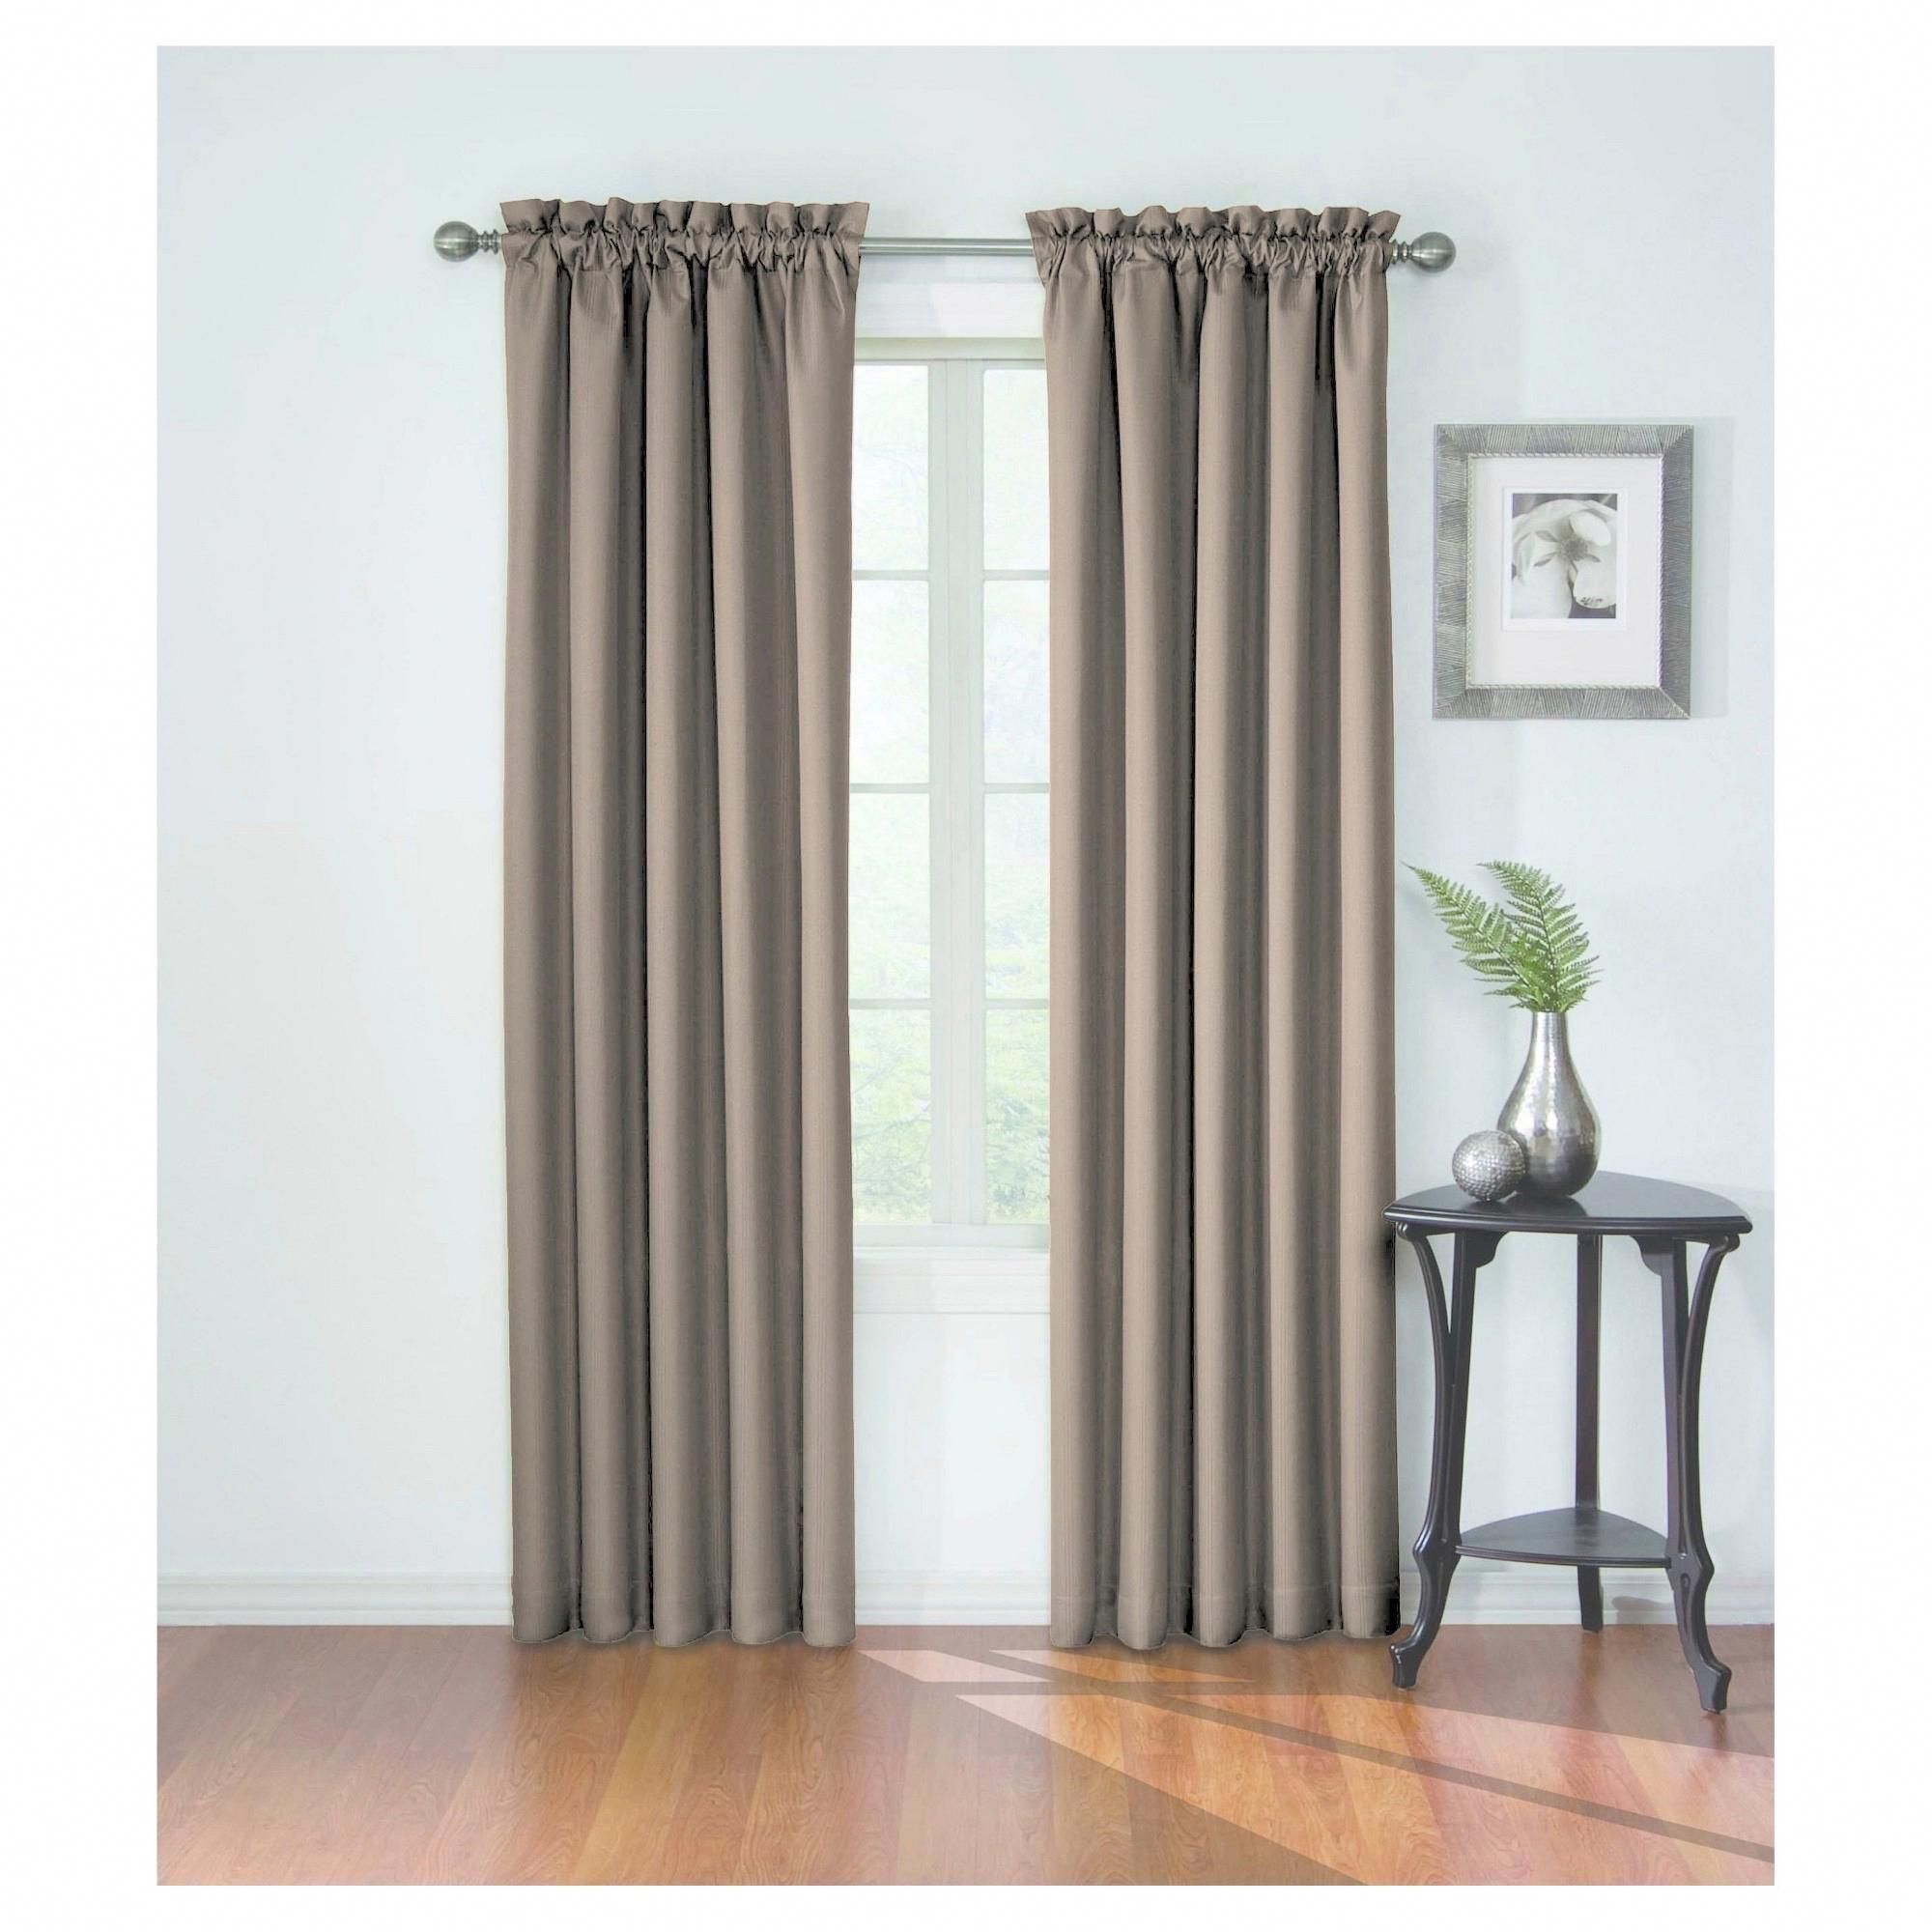 Corinne Blackout Curtain Tan 42 X63 Eclipse Roomdarkeningideas Blackoutcurtainsforbedroom Black Blackout Curtains Curtains Grey Blackout Curtains